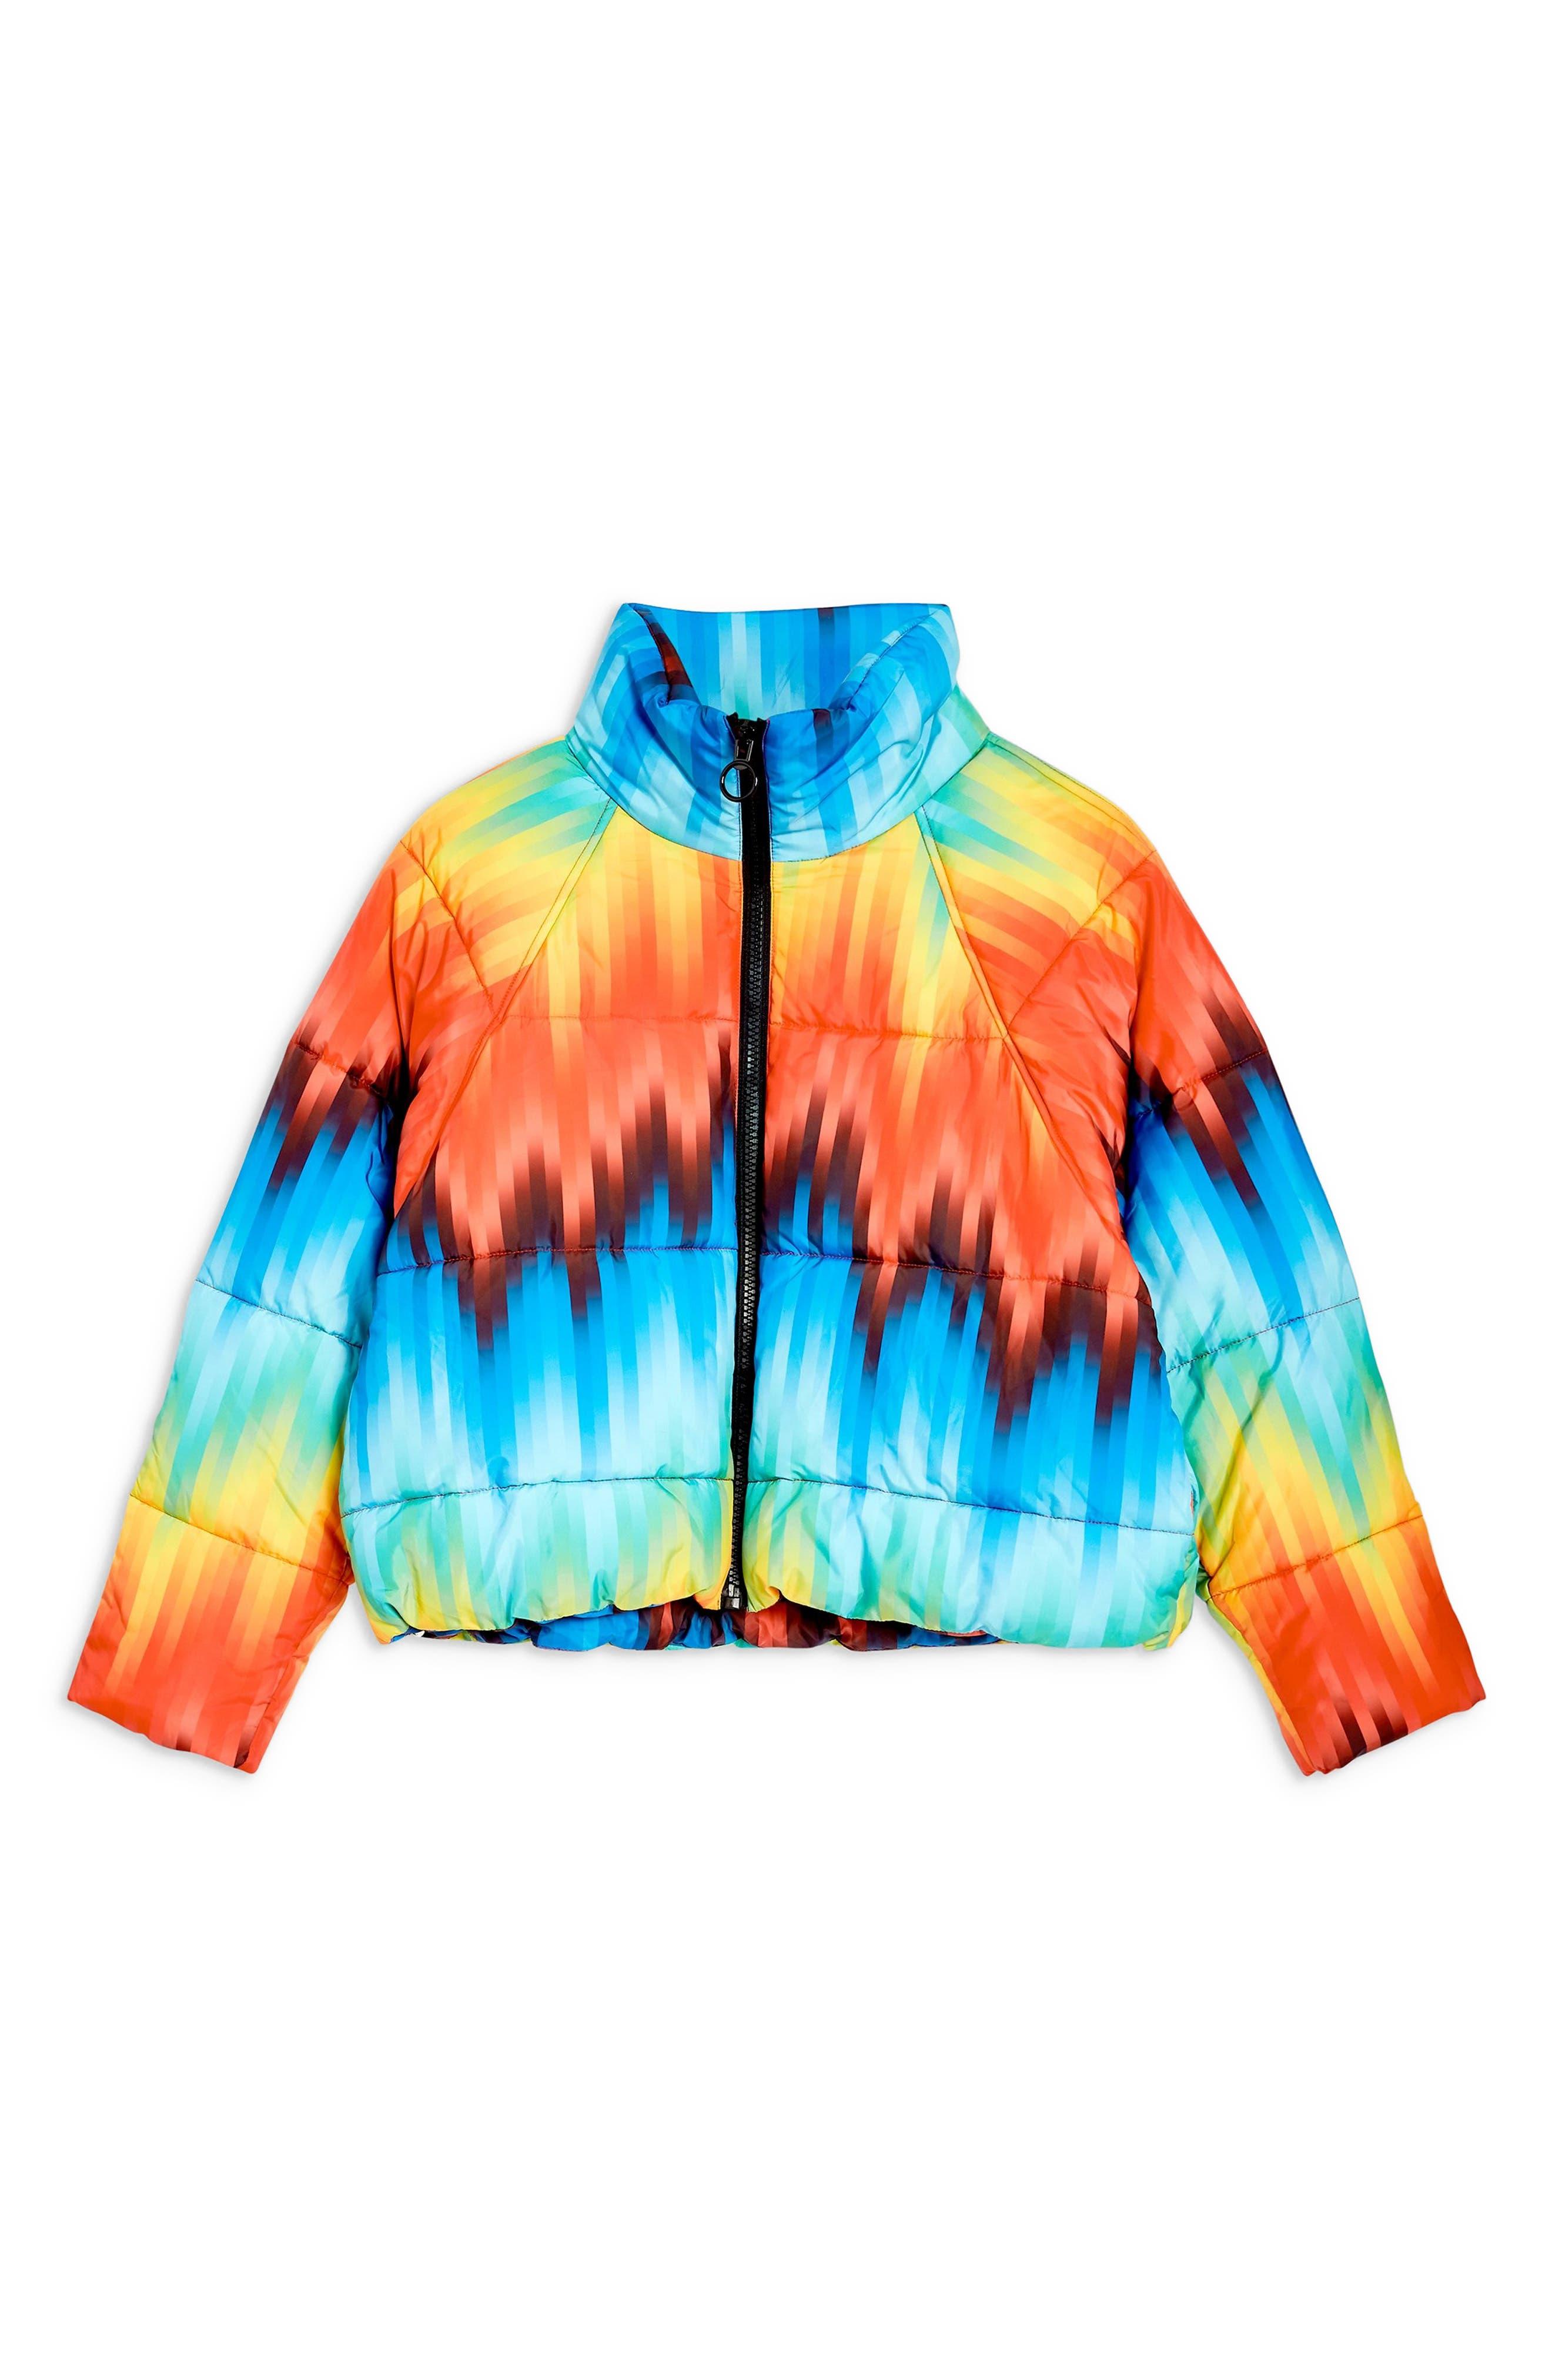 TOPSHOP, Rainbow Puffer Jacket, Alternate thumbnail 3, color, 460